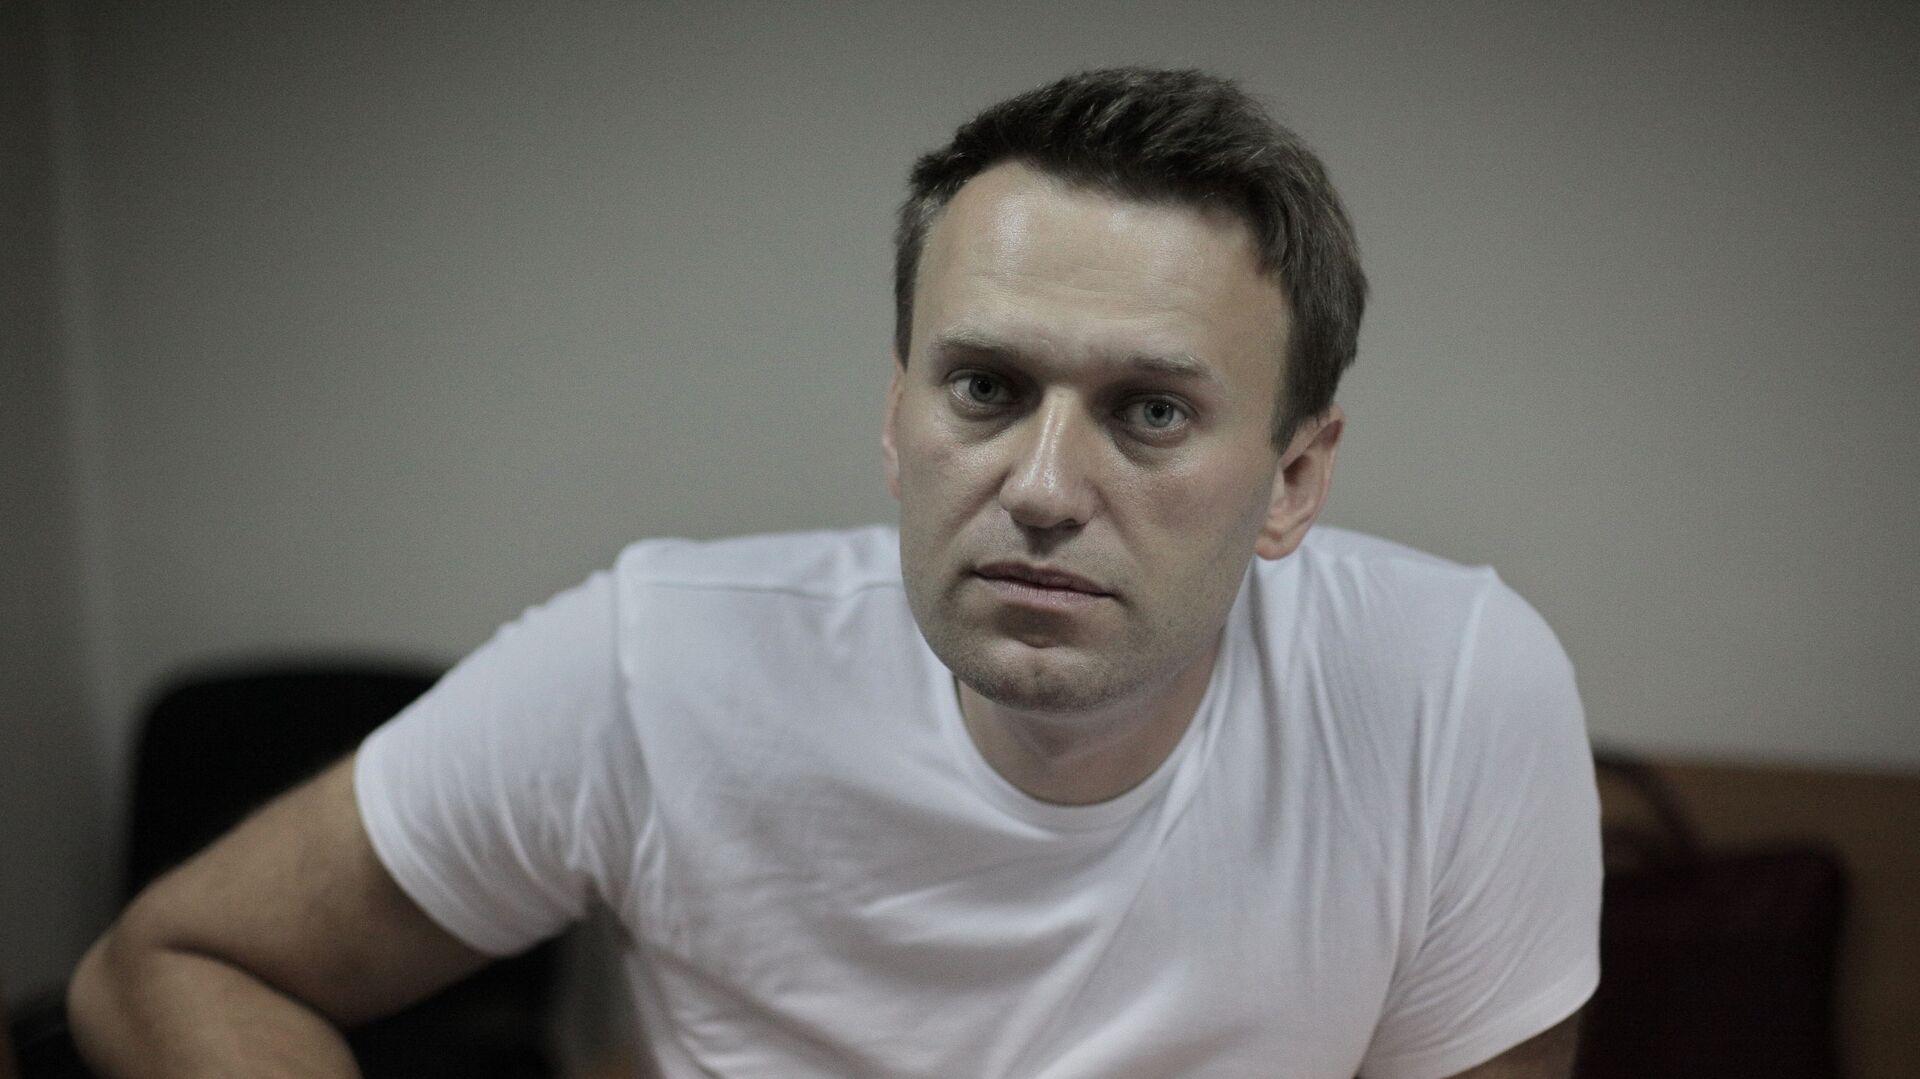 Alexéi Navalni, opositor ruso - Sputnik Mundo, 1920, 27.01.2021